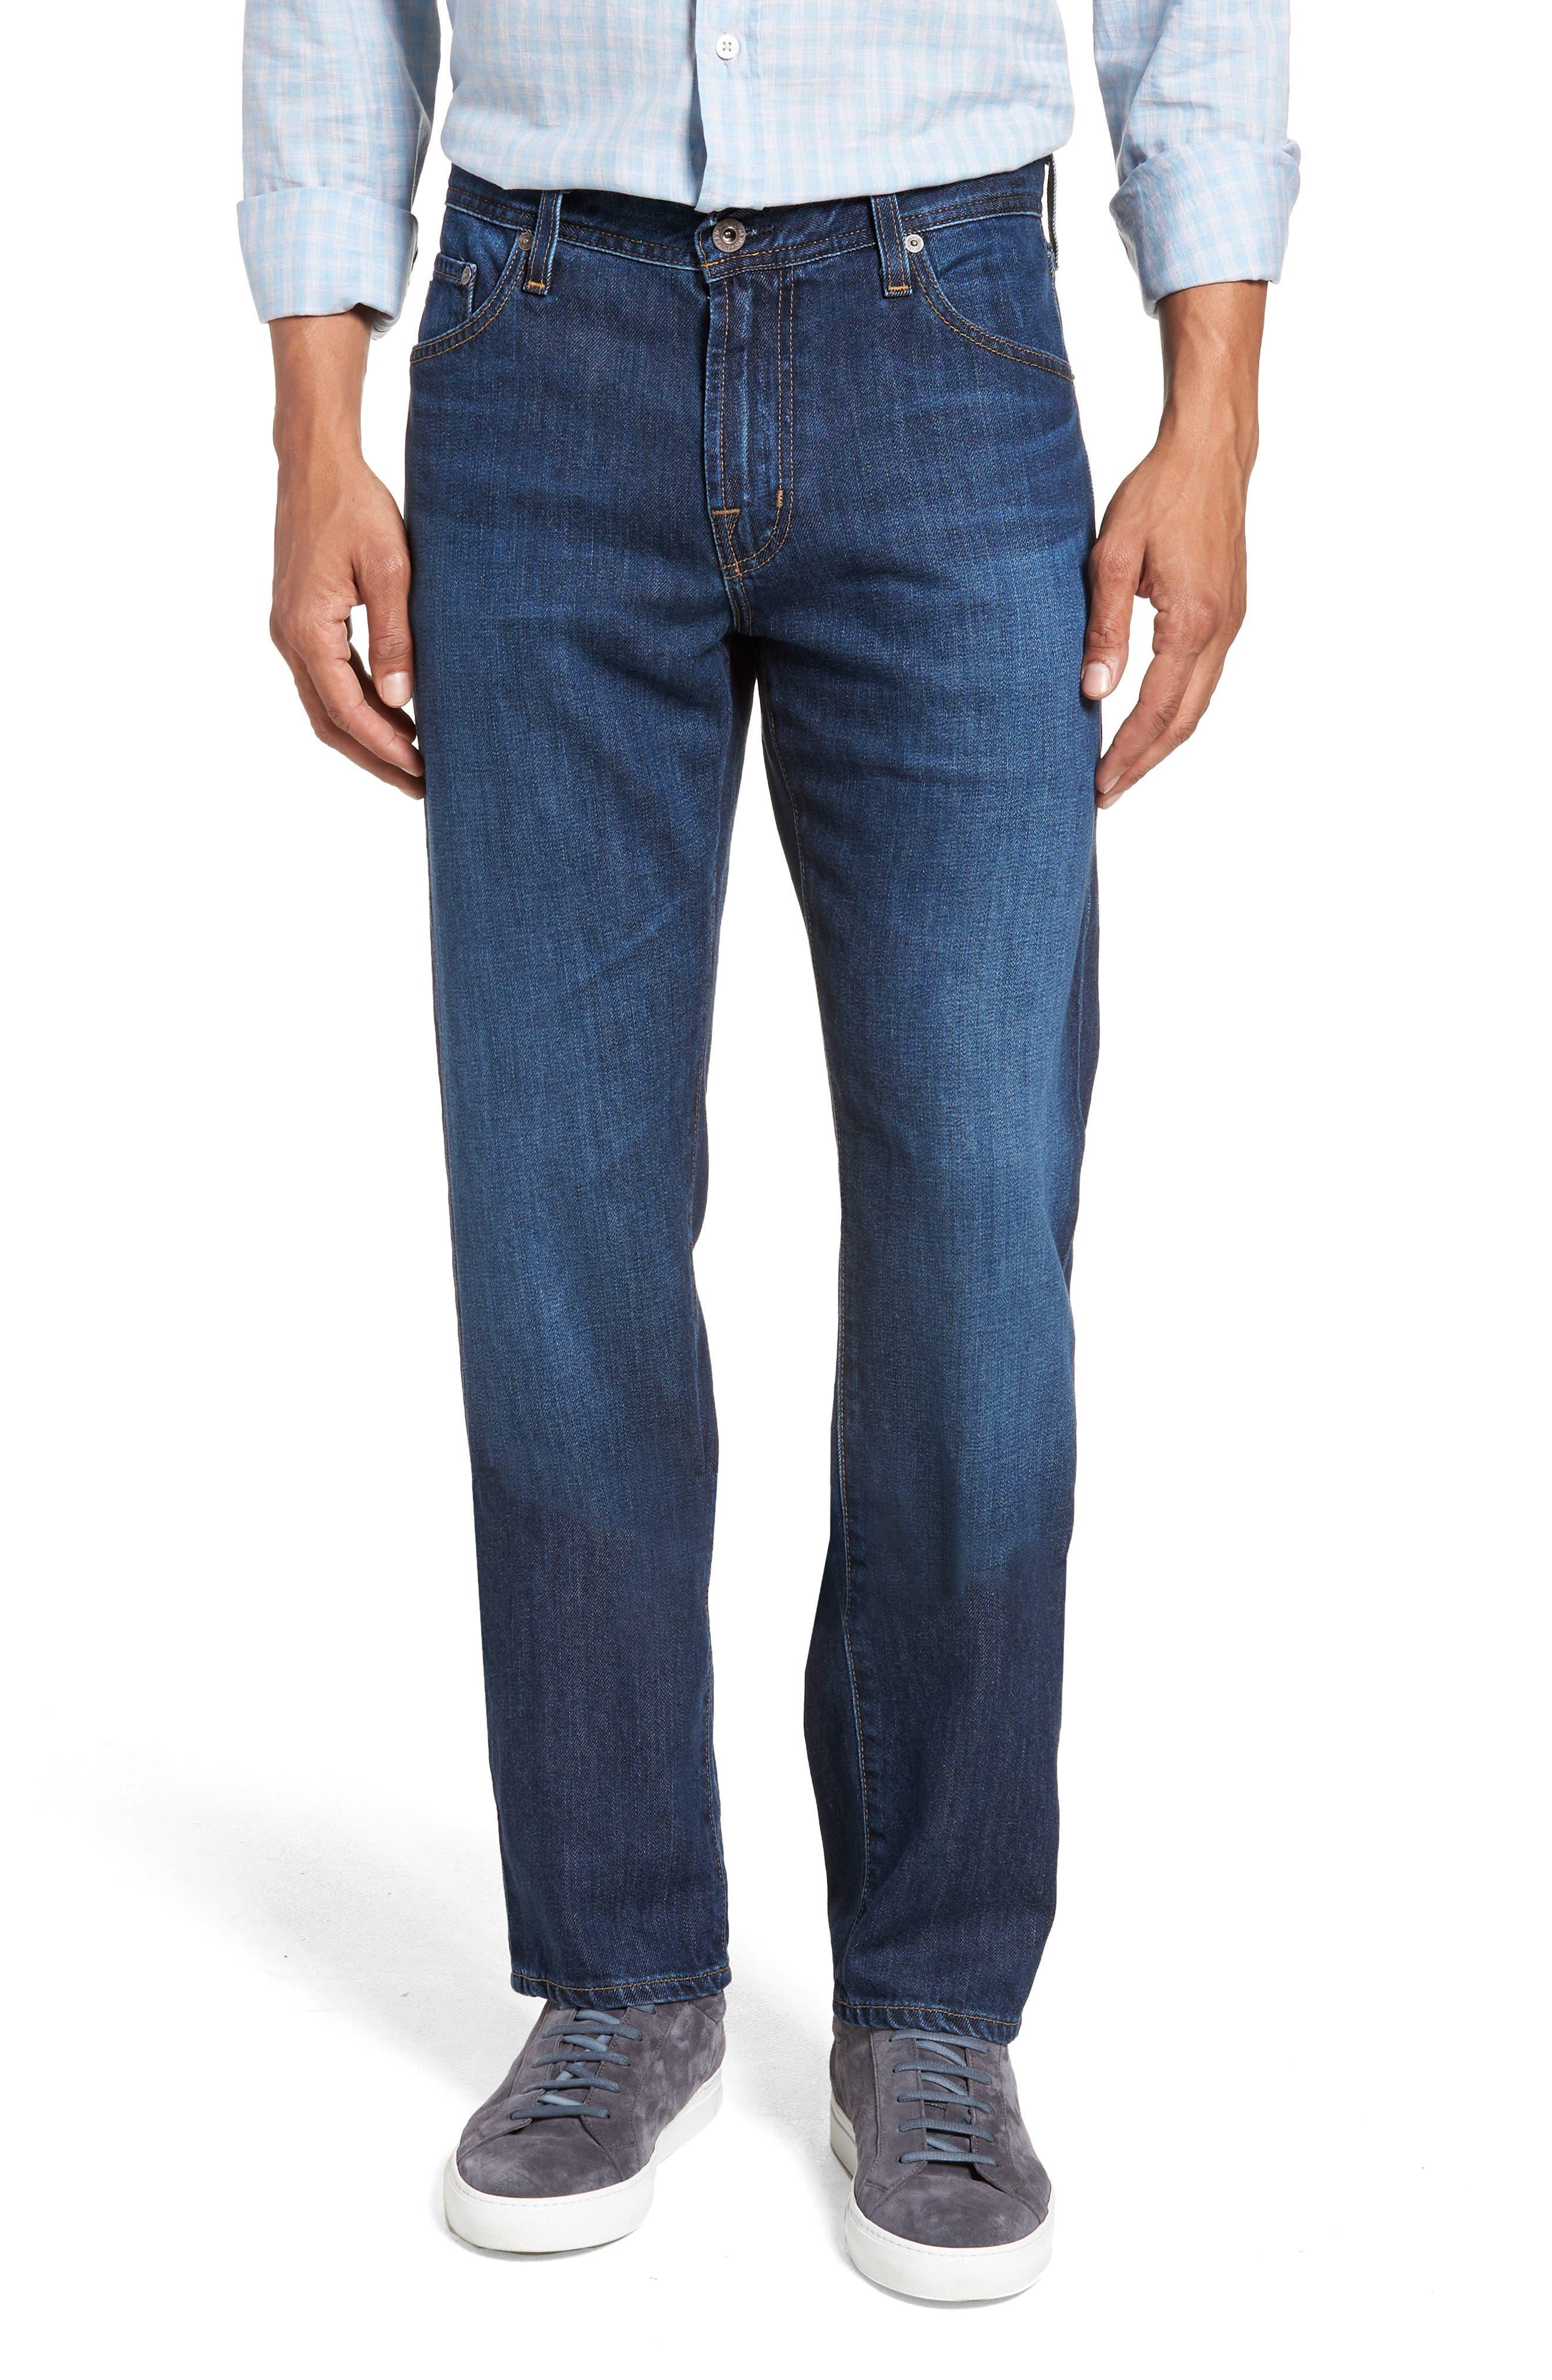 Graduate Slim Straight Leg Jeans,                             Main thumbnail 1, color,                             477